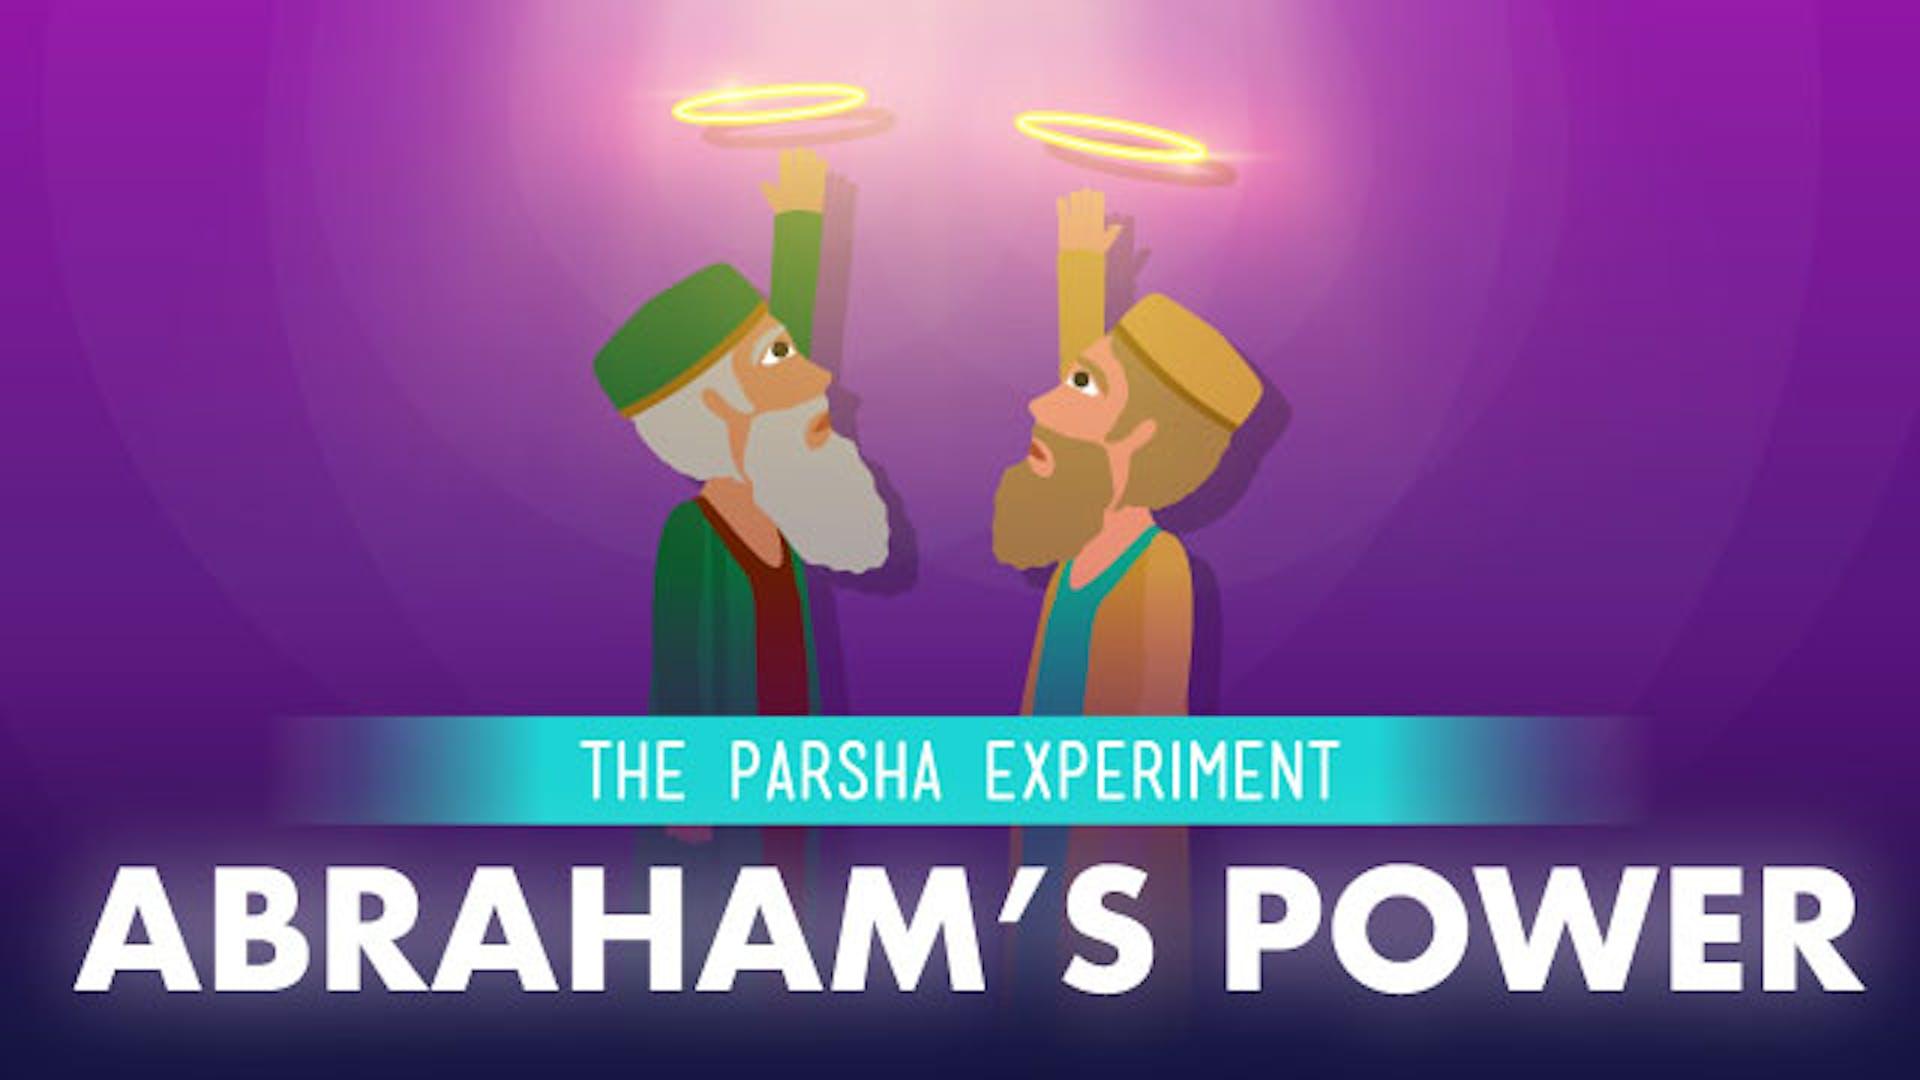 Abraham God destroyed Sodom Gomorrah